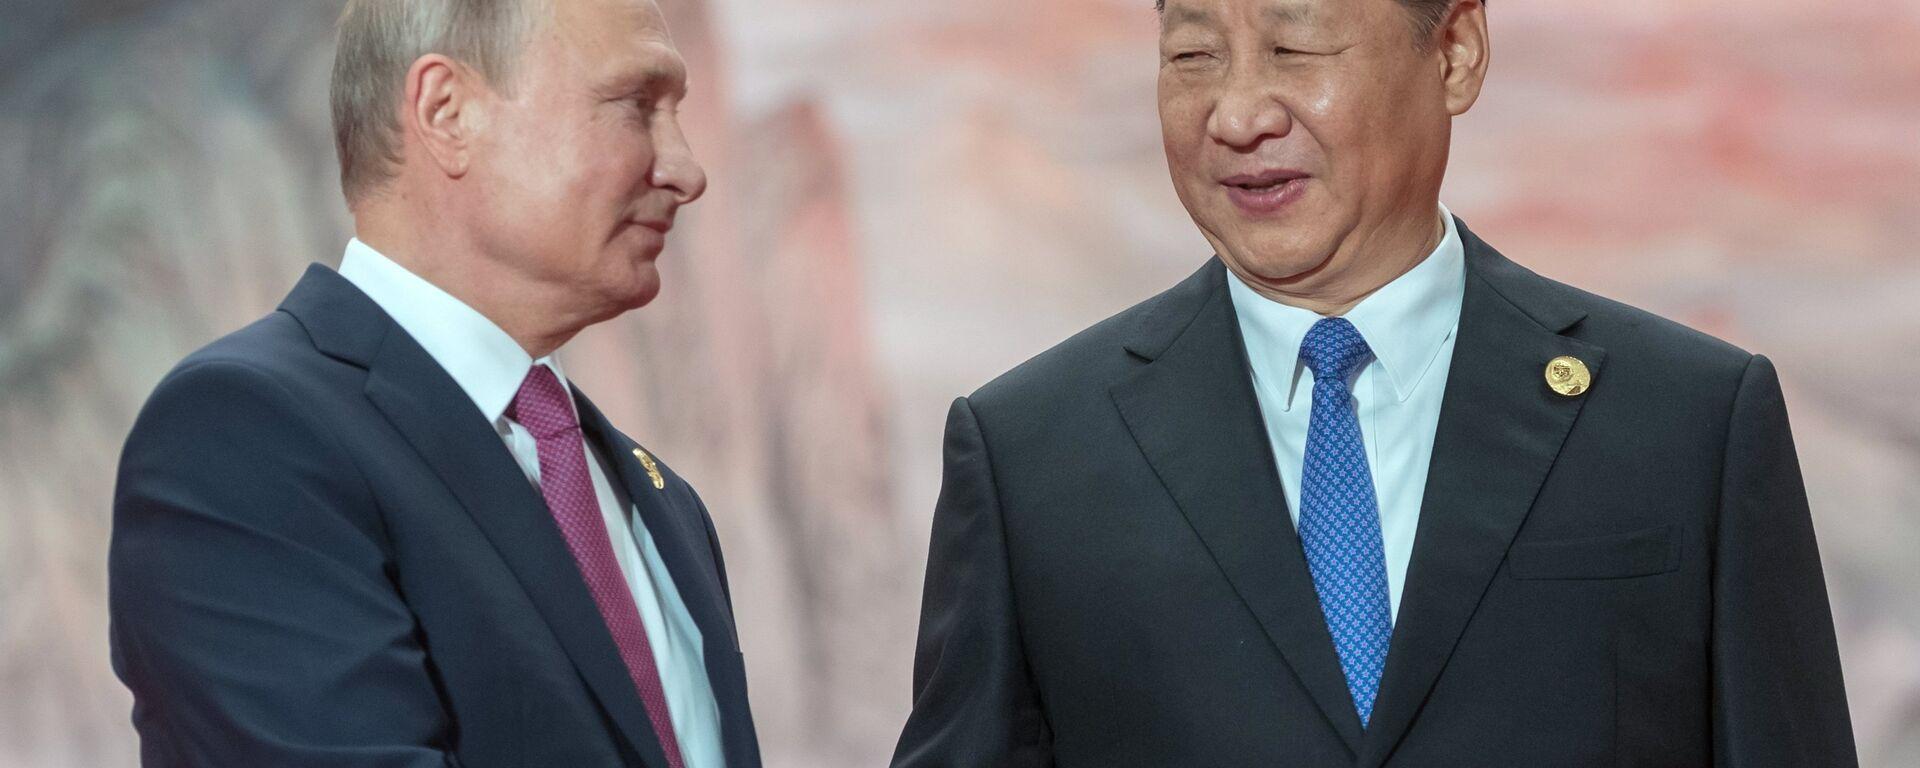 Presidente de Rusia, Vladímir Putin, y presidente de China, Xi Jinping - Sputnik Mundo, 1920, 25.08.2021